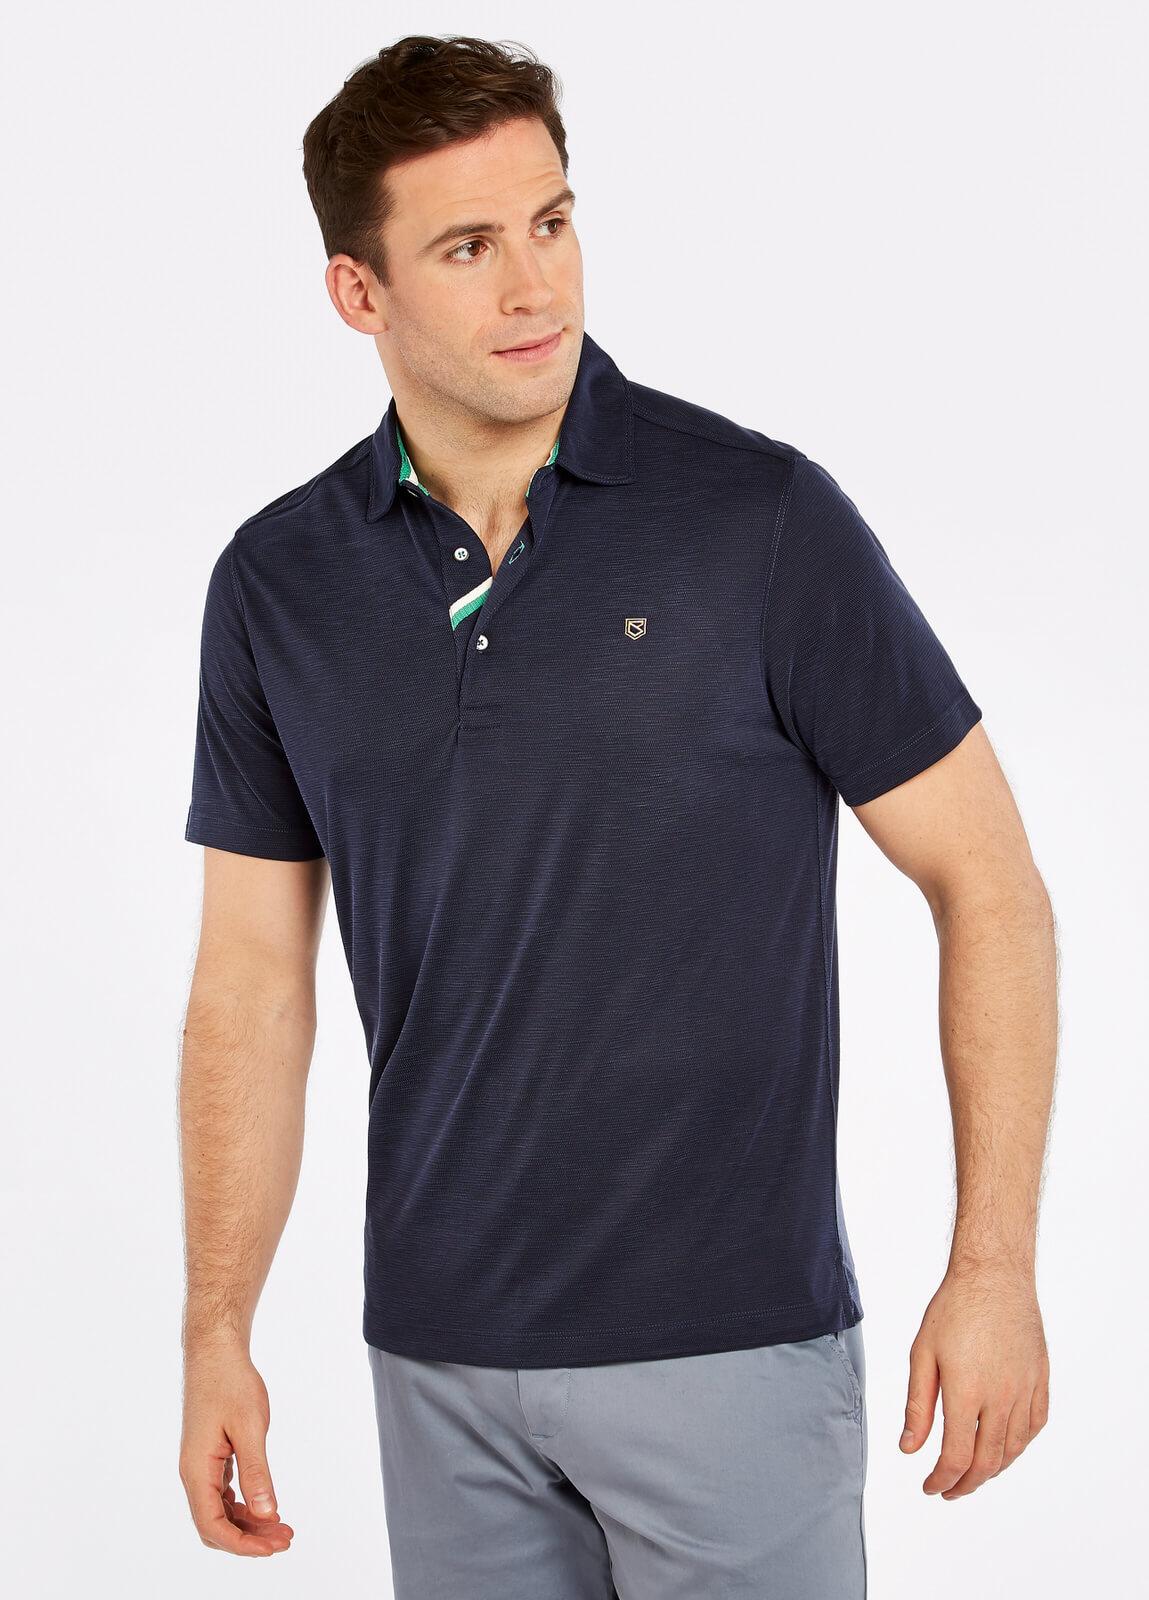 Dubarry_Corbally_Polo_Shirt_Navy_on_model